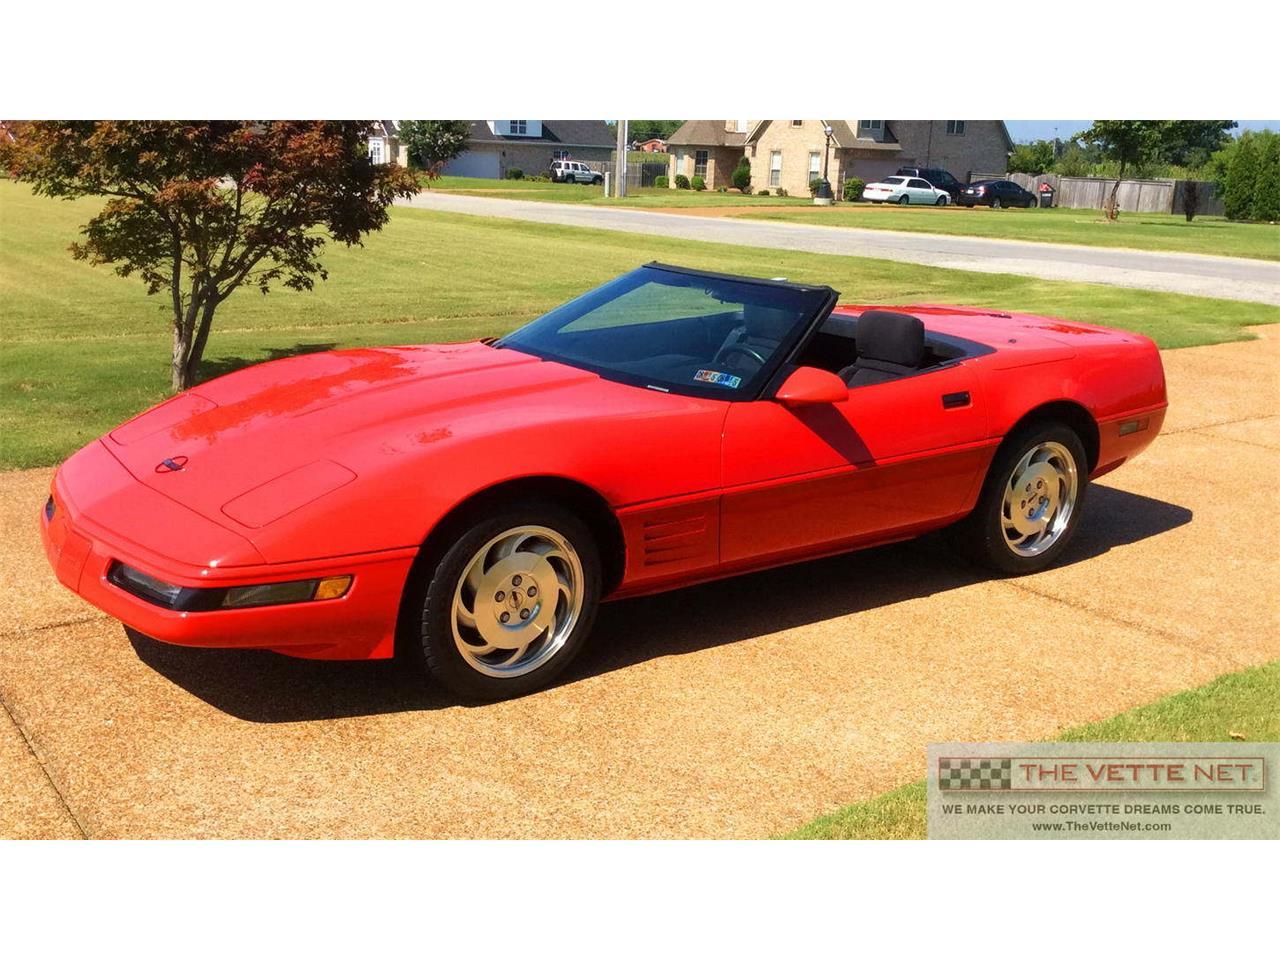 Large Picture of 1993 Chevrolet Corvette - $19,990.00 - LISB